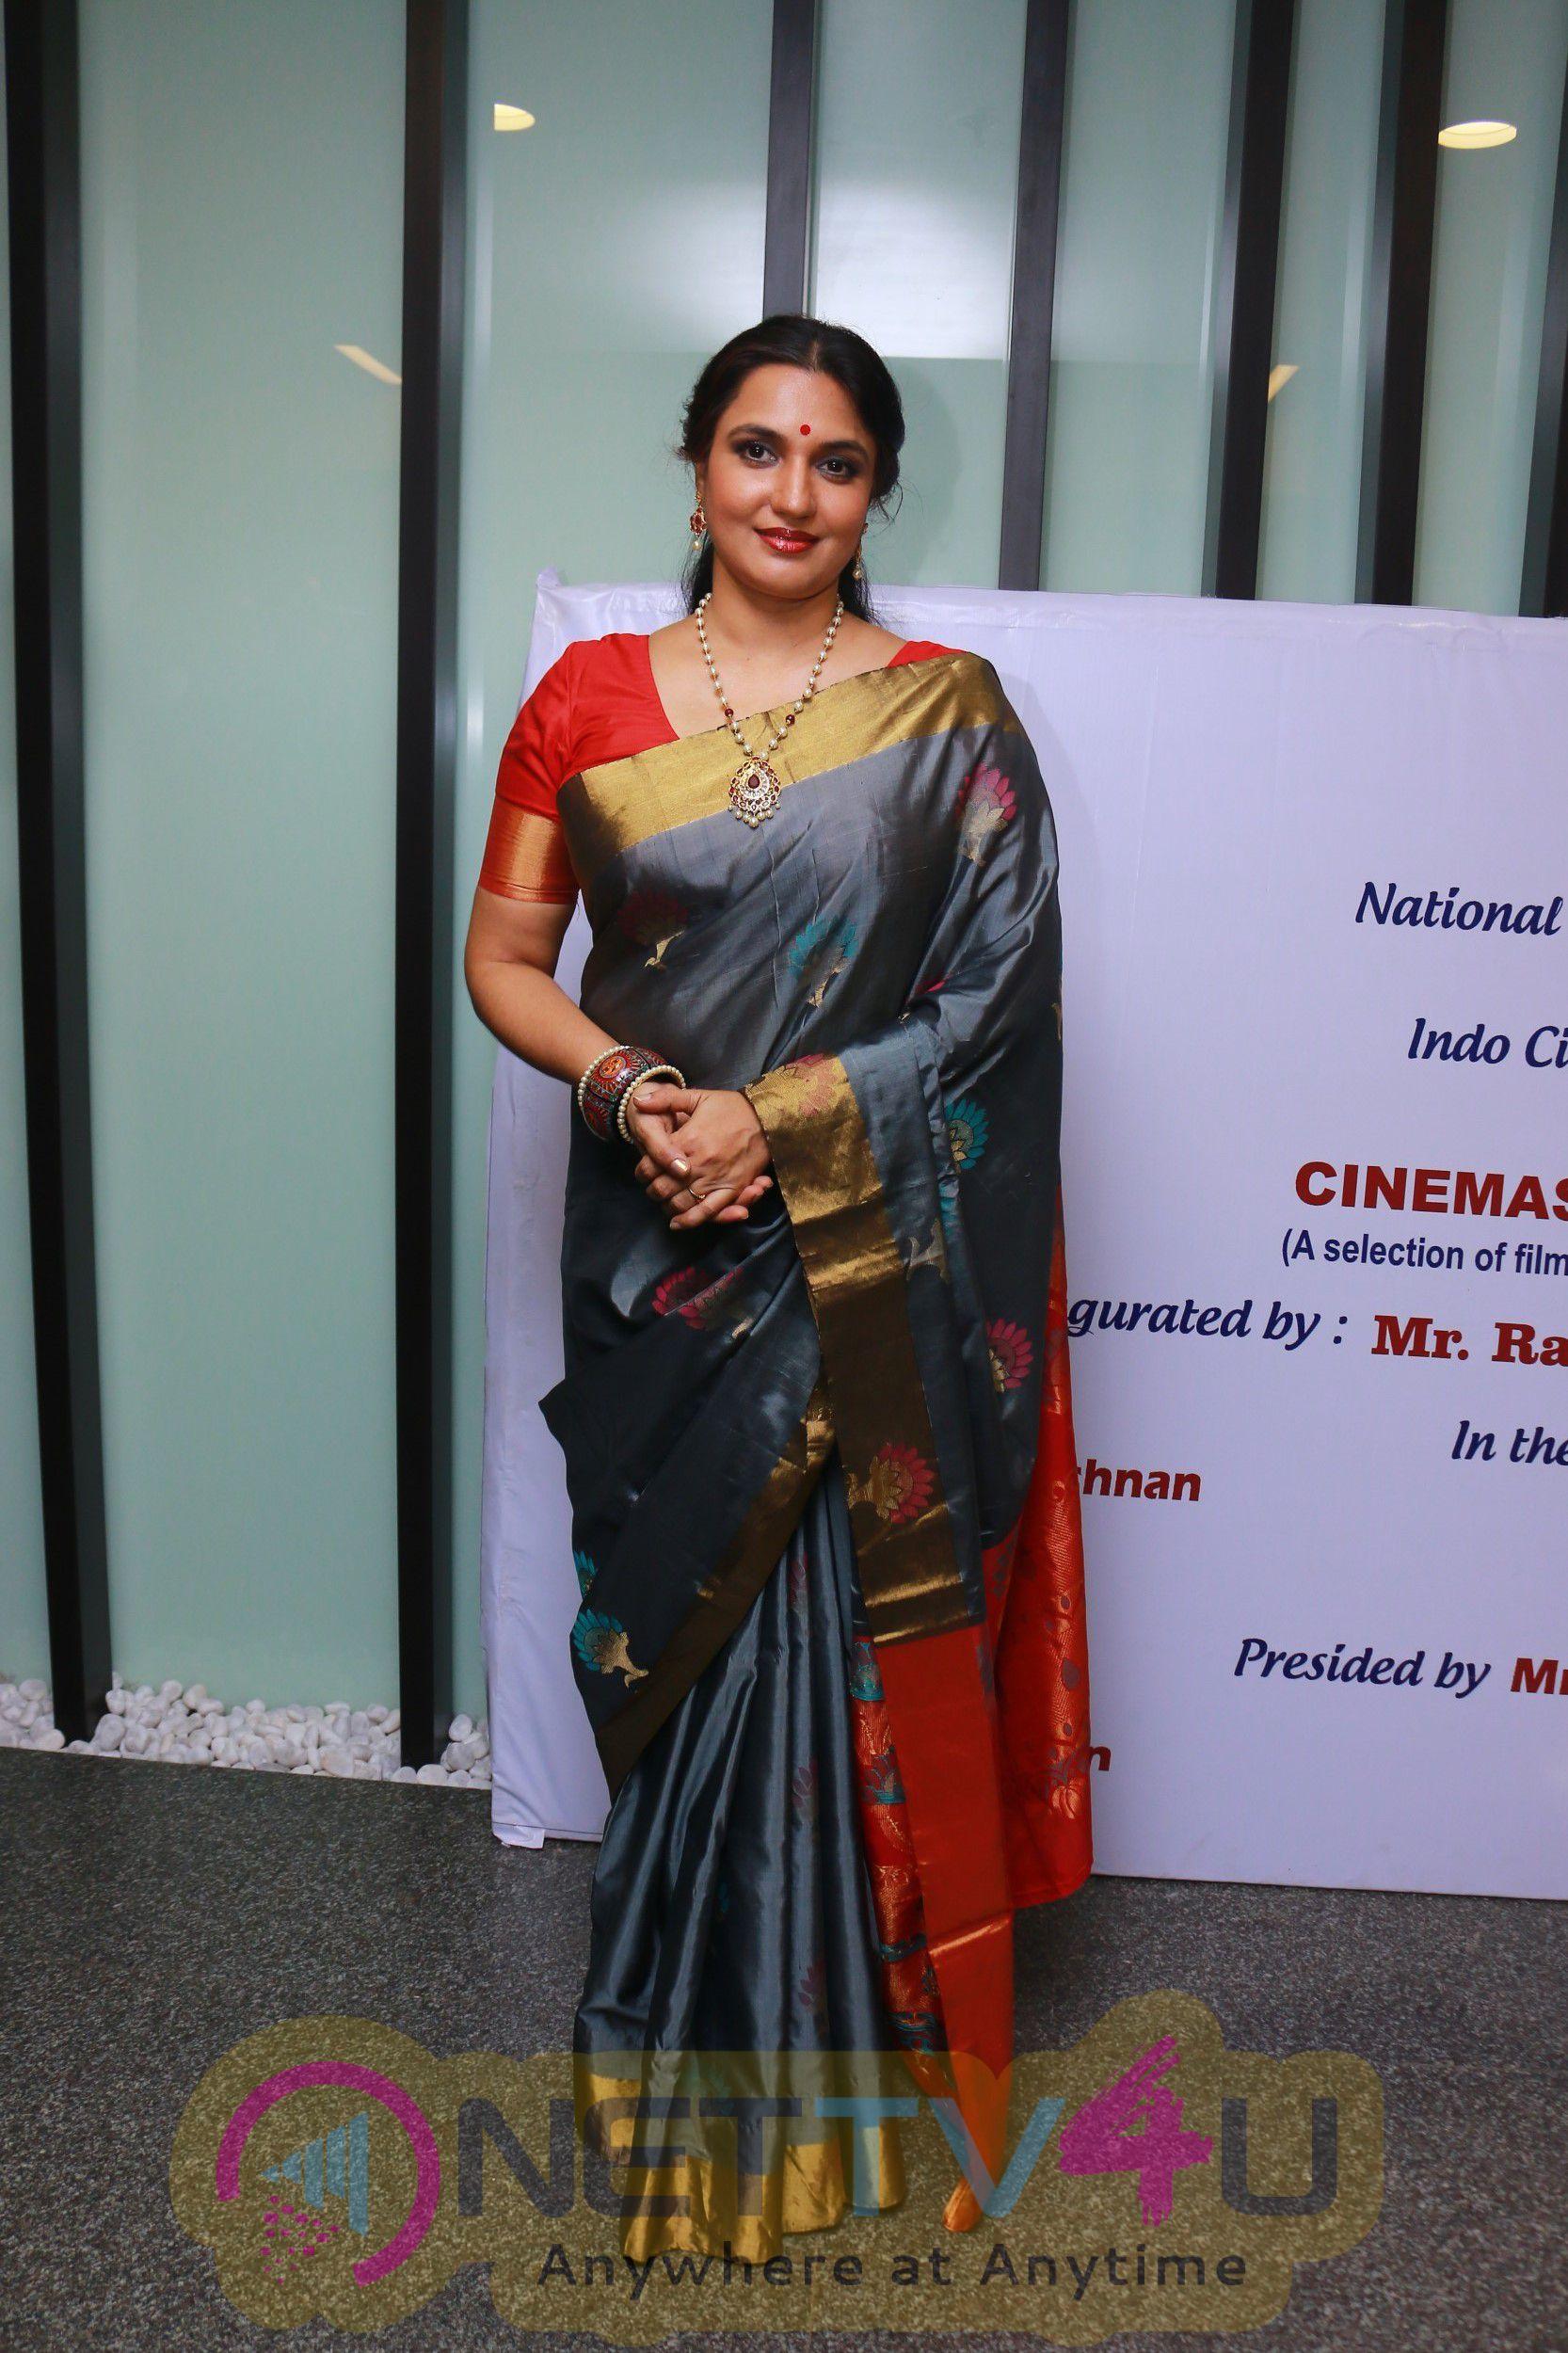 Cinemas Of India Showcase Inauguration Event Photos Tamil Gallery